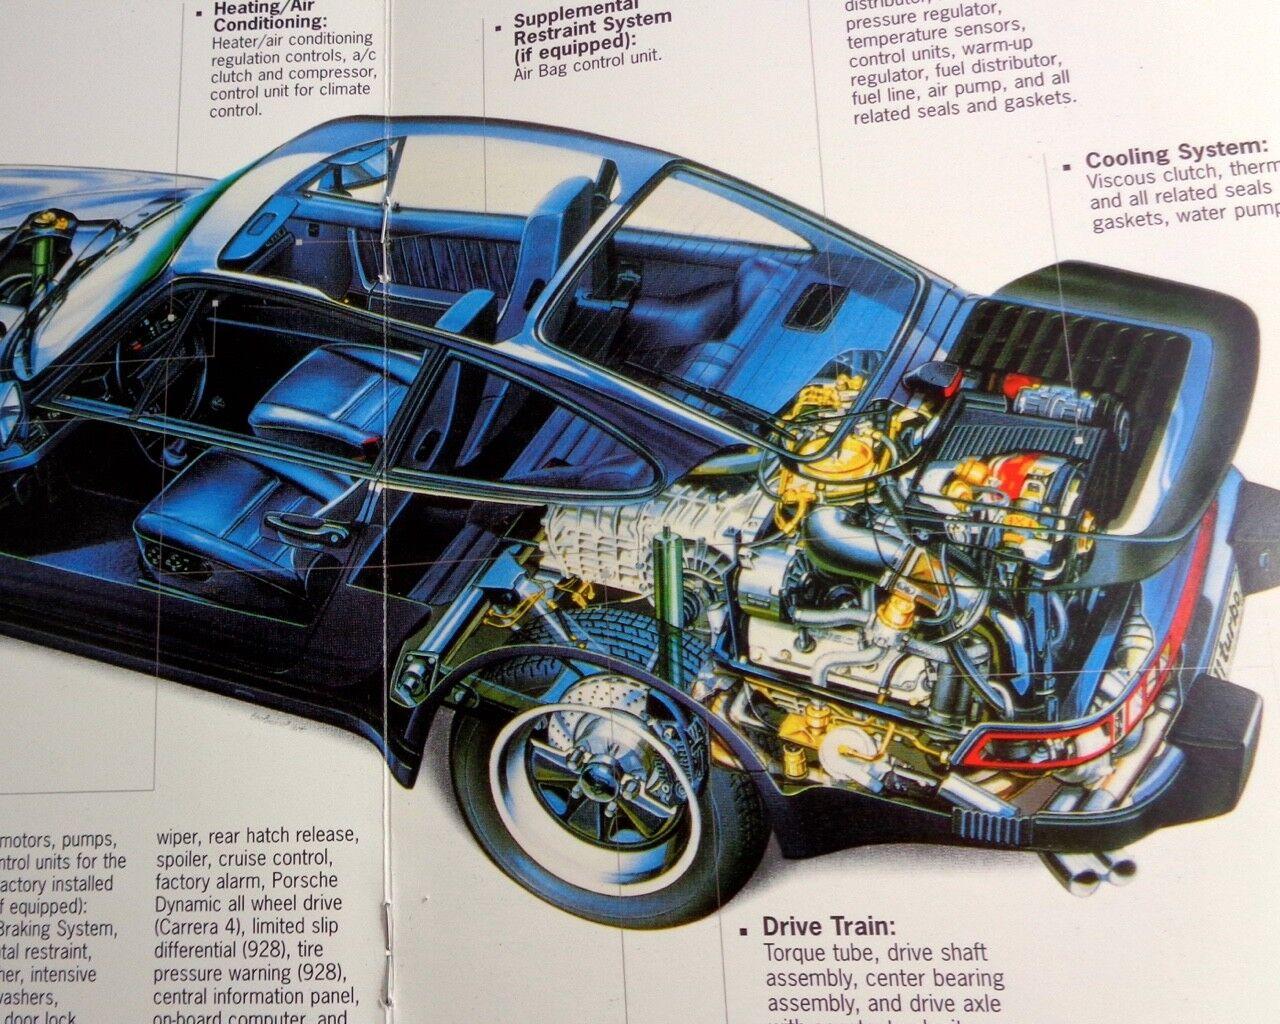 PORSCHE 911 993 Carrera & Turbo Dealer Directory, Warranty, Maintenance Schedule